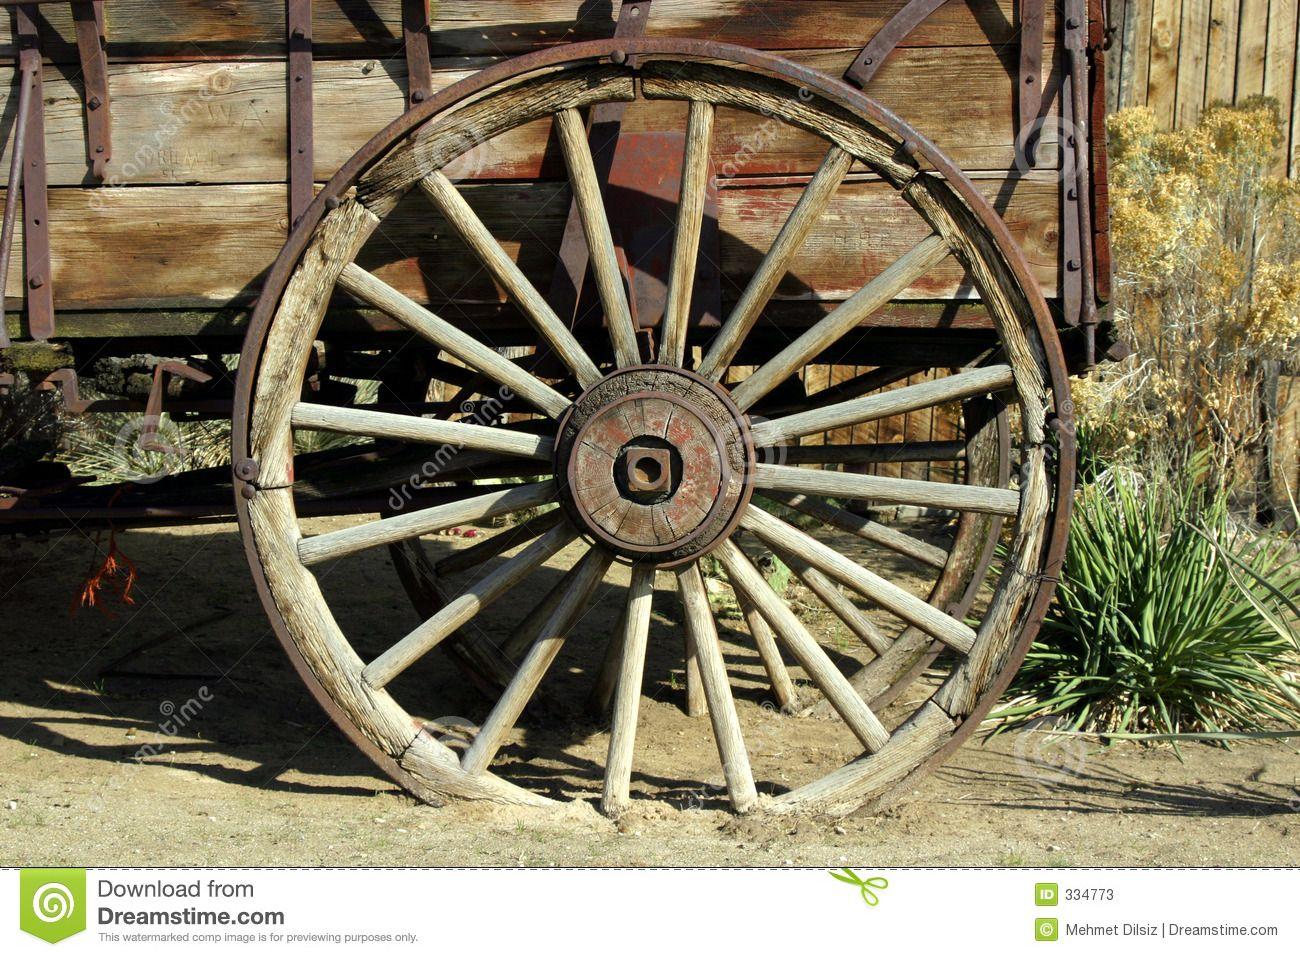 Antique Wagon Wheels | Old Antique Wagon Wheel Stock Photos   Image: 334773